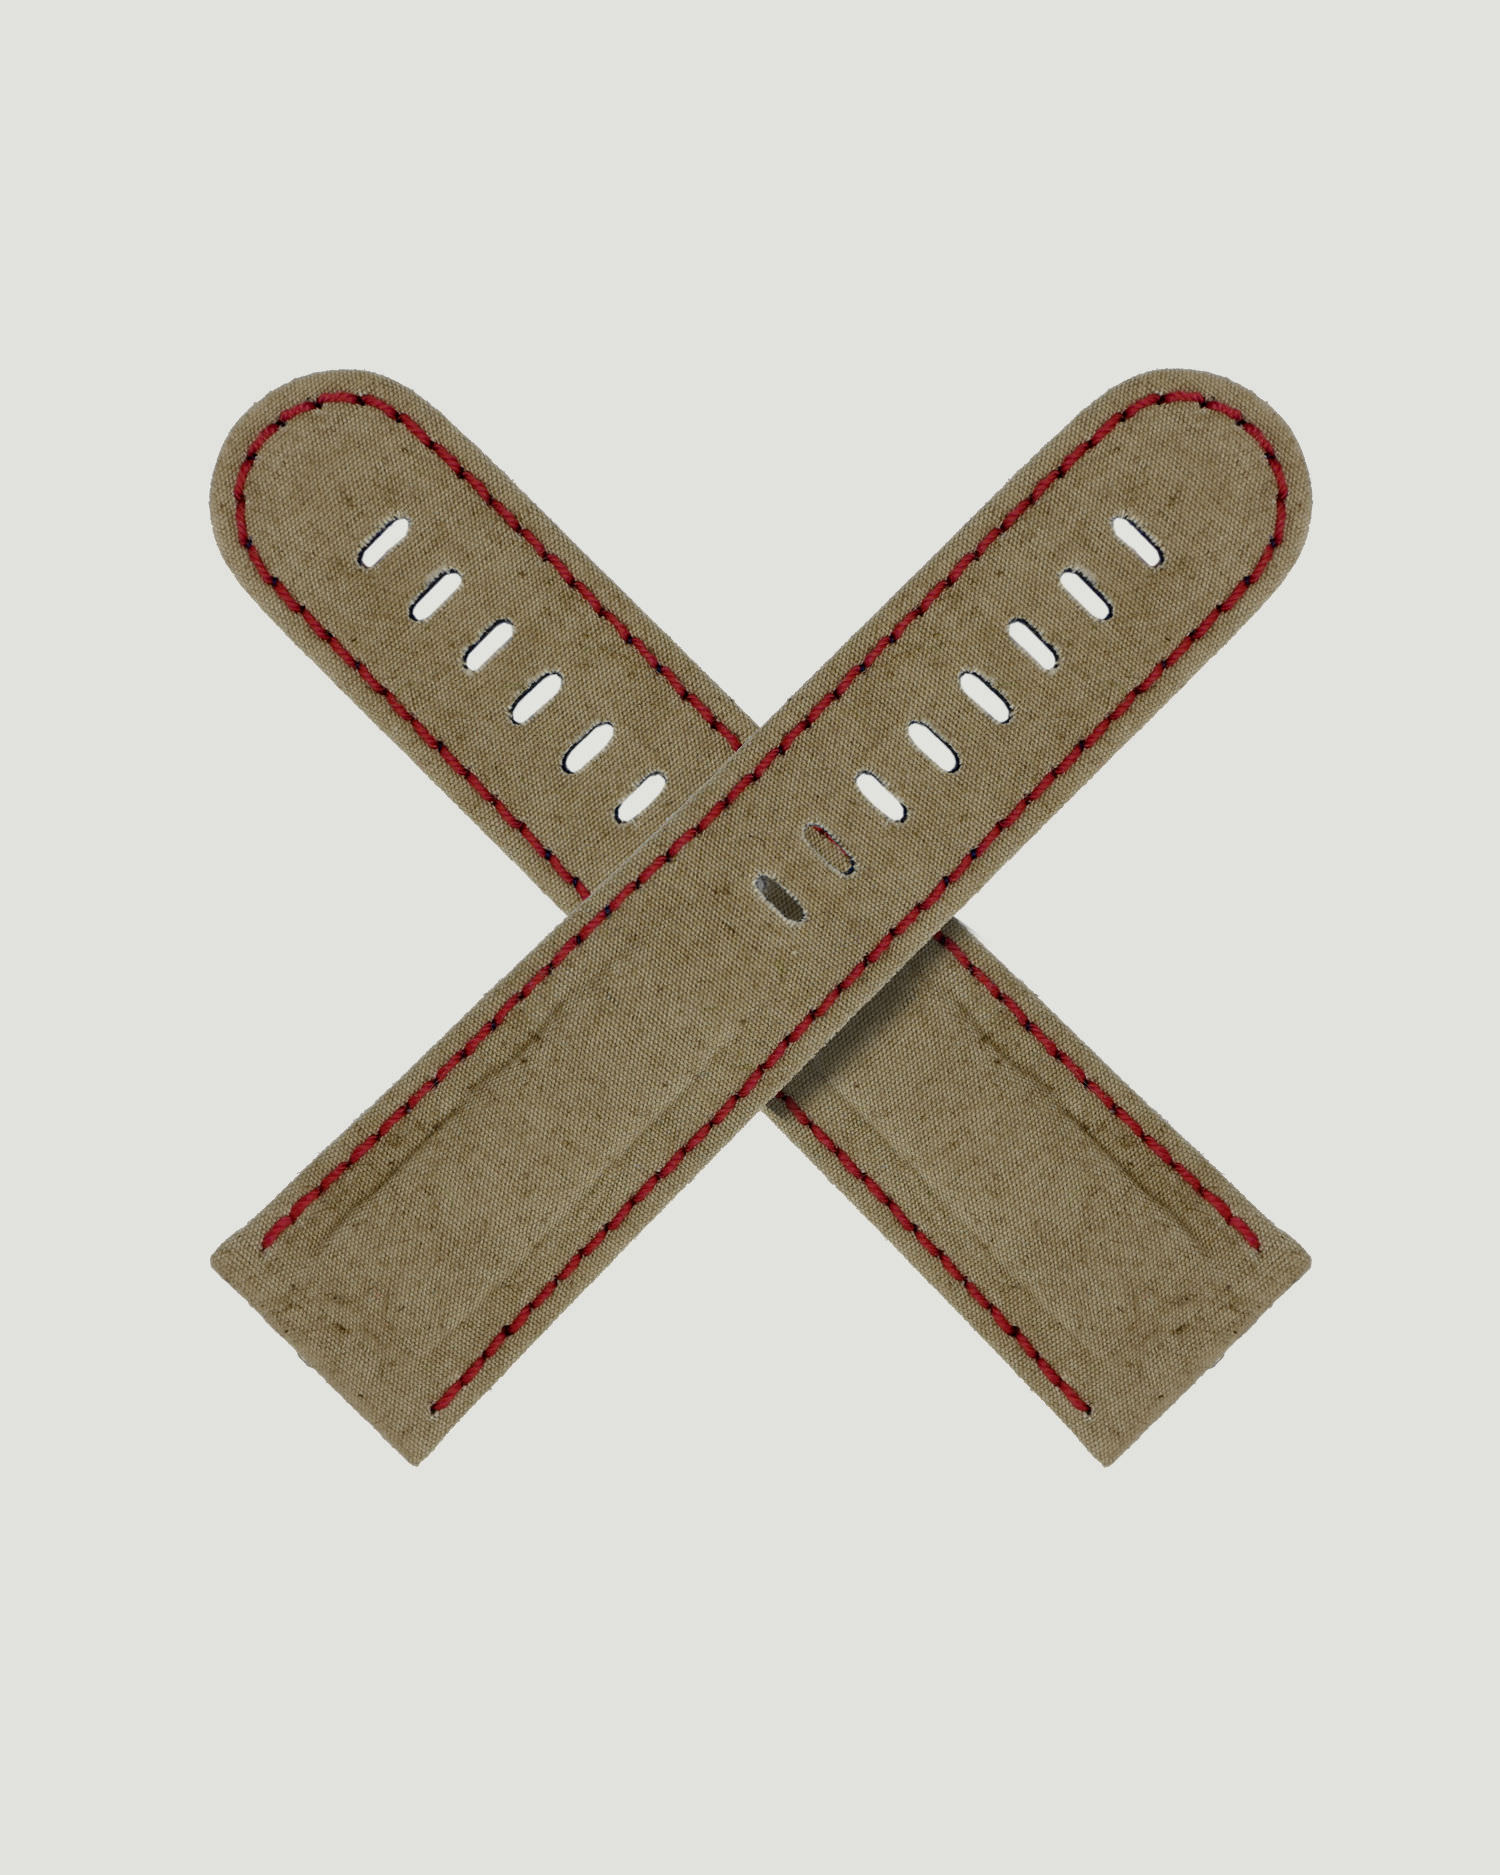 Japanese Linen Watch Straps